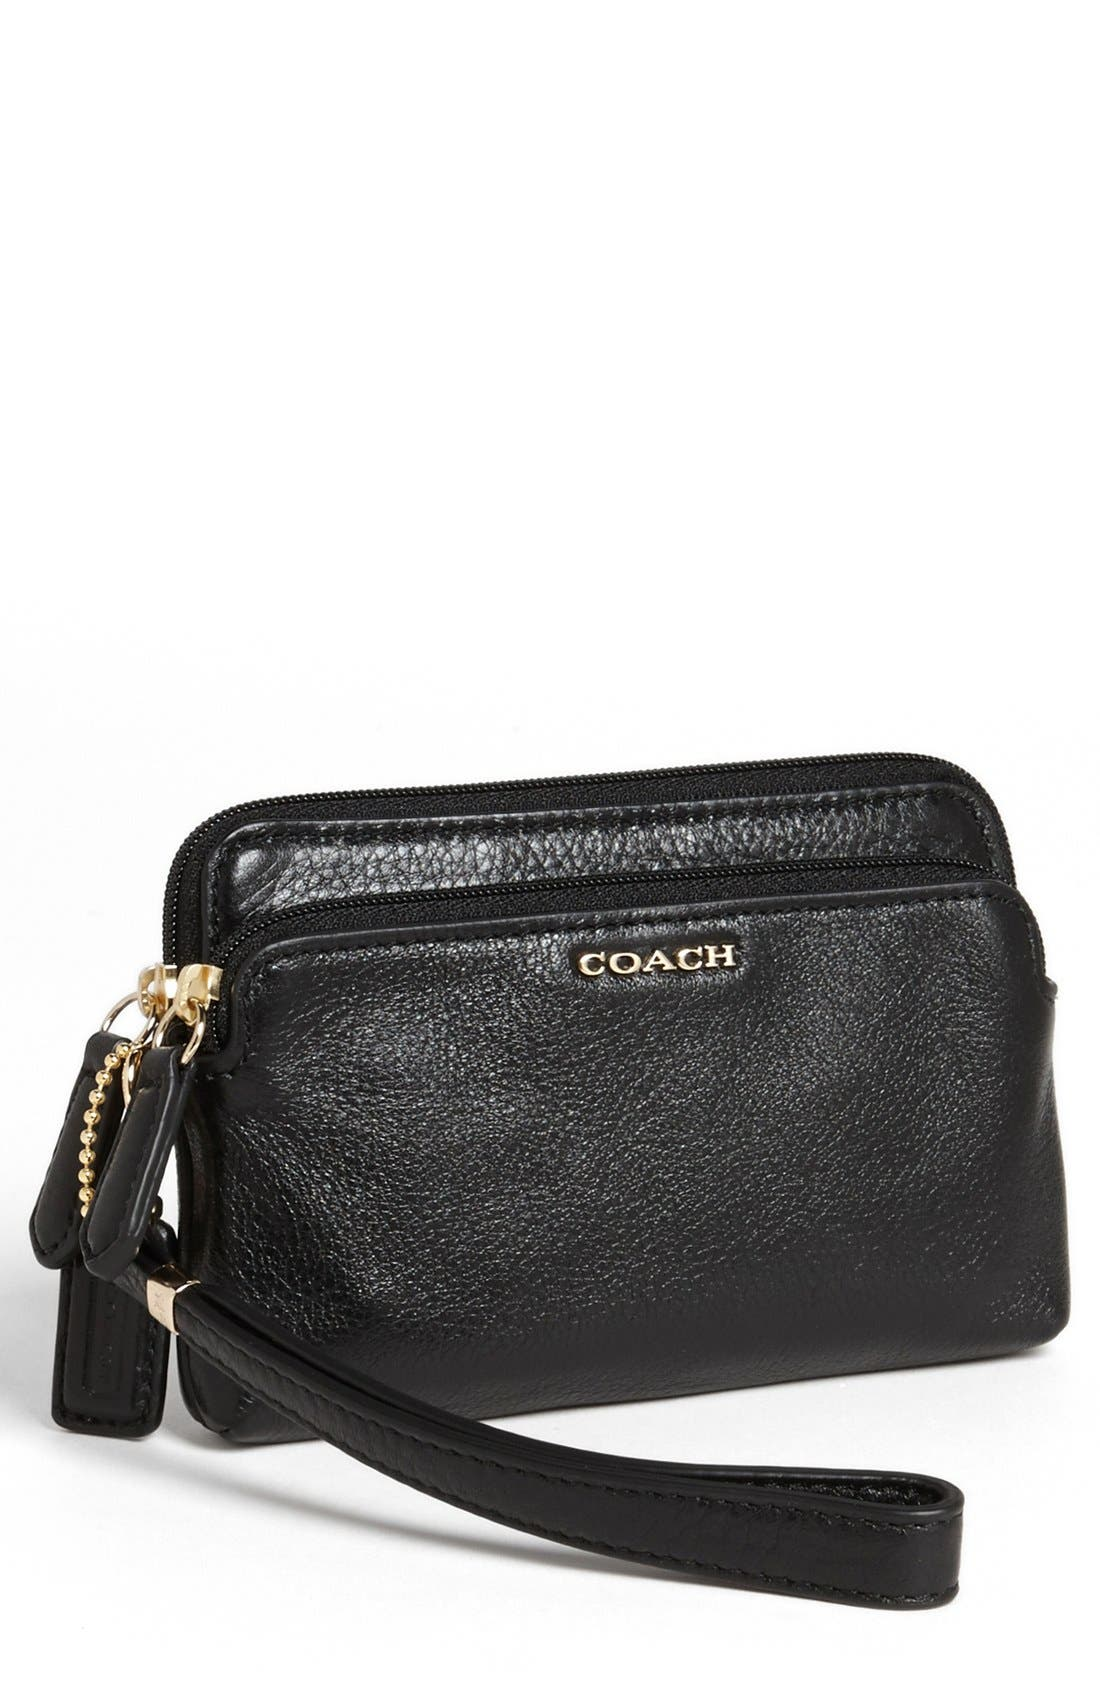 Alternate Image 1 Selected - COACH 'Madison' Leather Wristlet